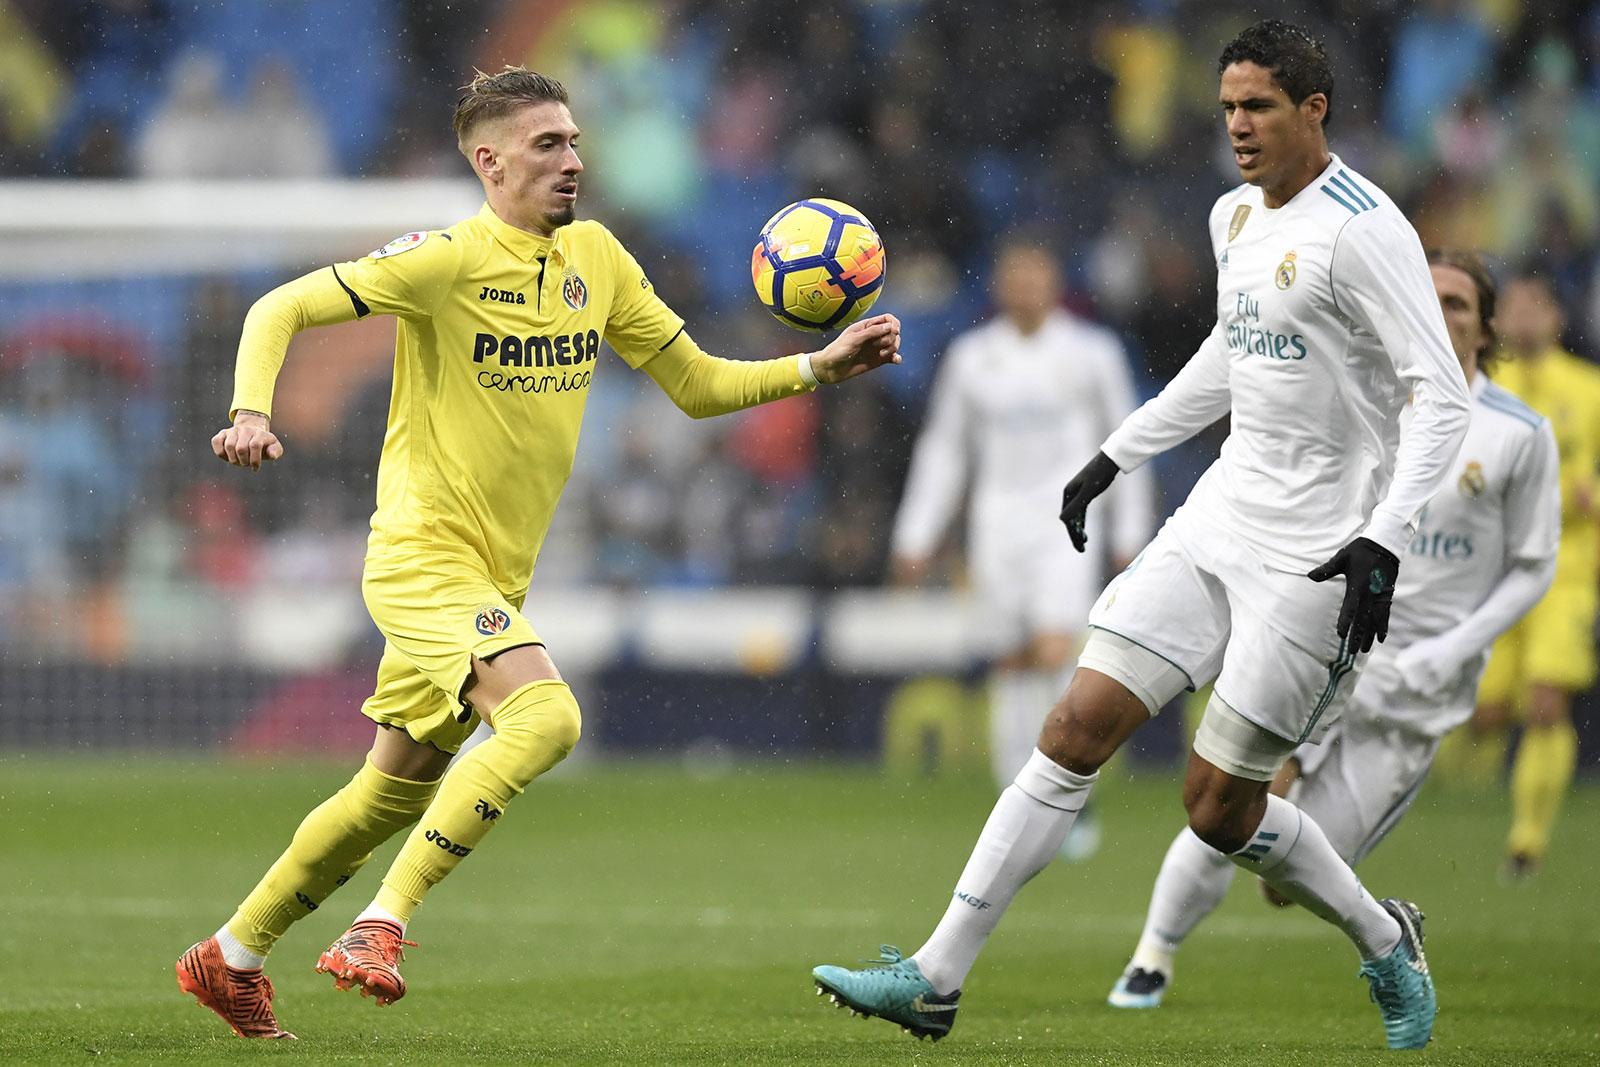 Samu Castillejo and Raphael Varane during Real Madrid-Villarreal at Estadio Santiago Bernabéu on January 13, 2018. )GABRIEL BOUYS/AFP/Getty Images)